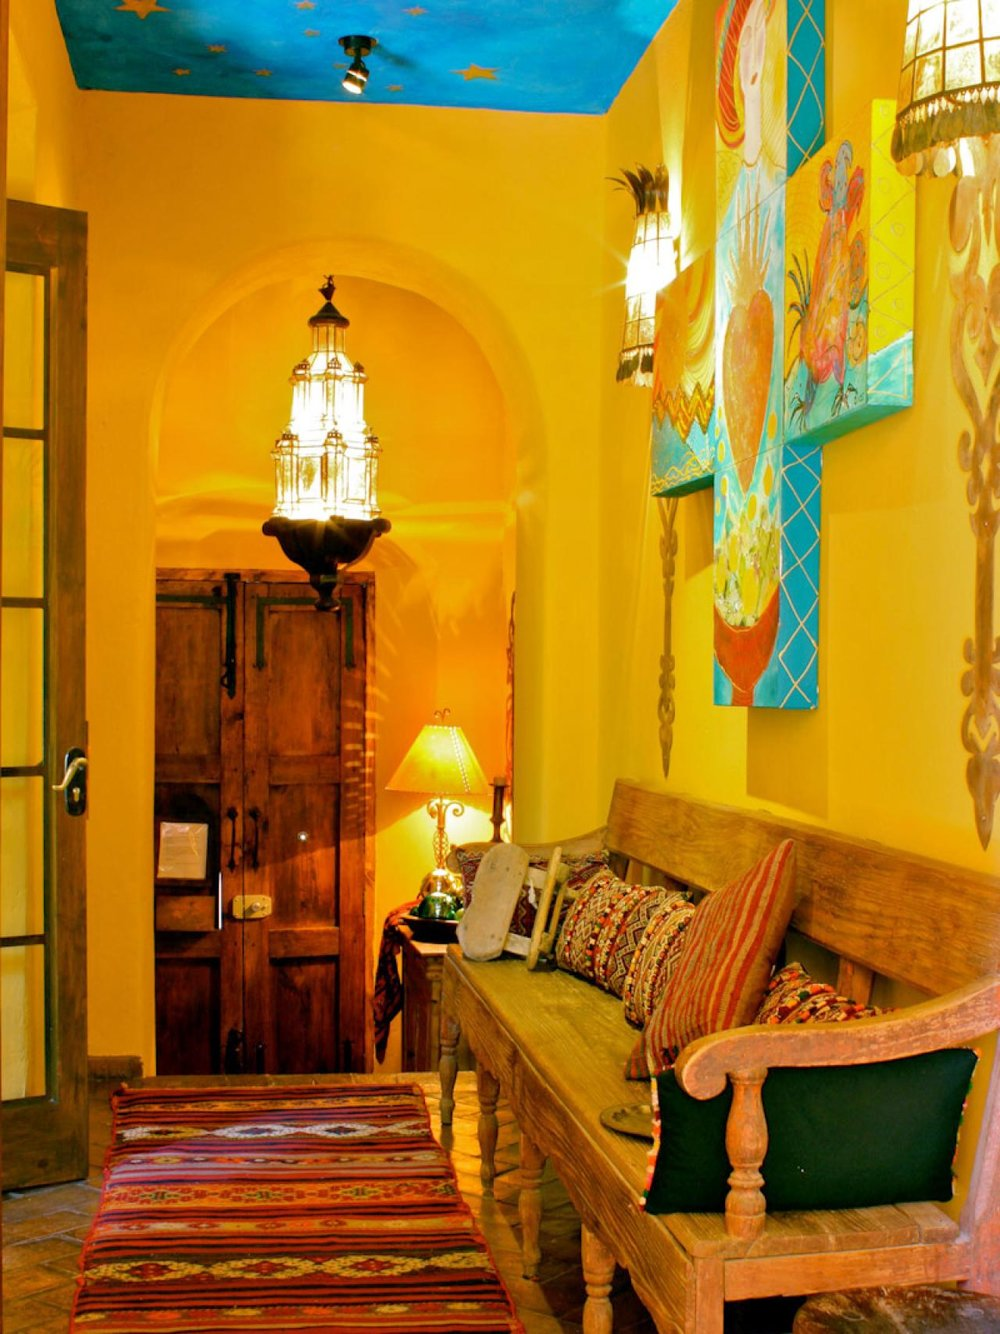 entry mex decor & Spanish Style Interior Decorating Tips from the Pros | SPAZIO LA